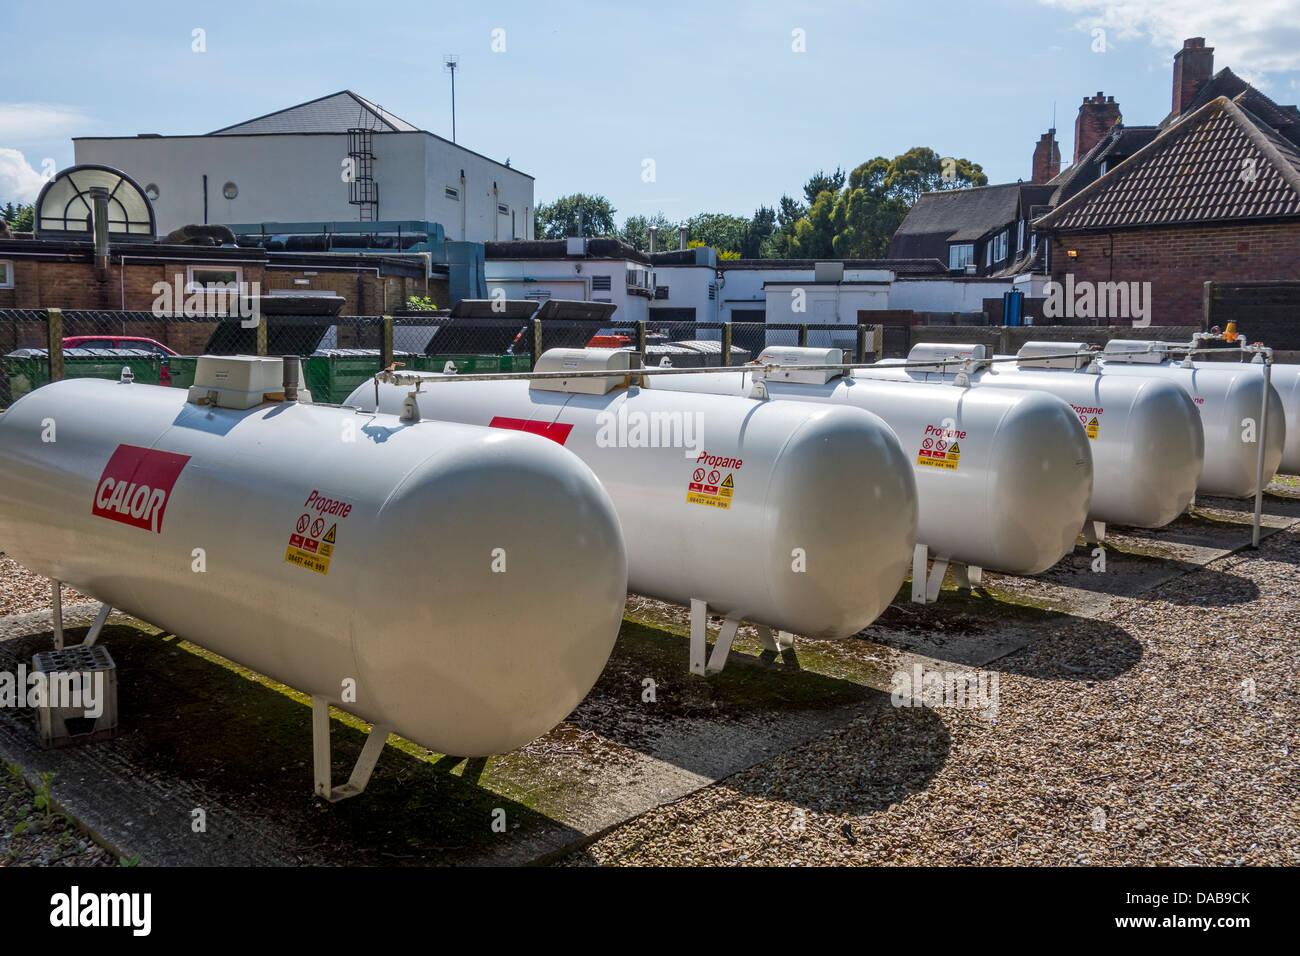 Farmers Gas Tank : Calor gas tank farm installation propane tanks stock photo